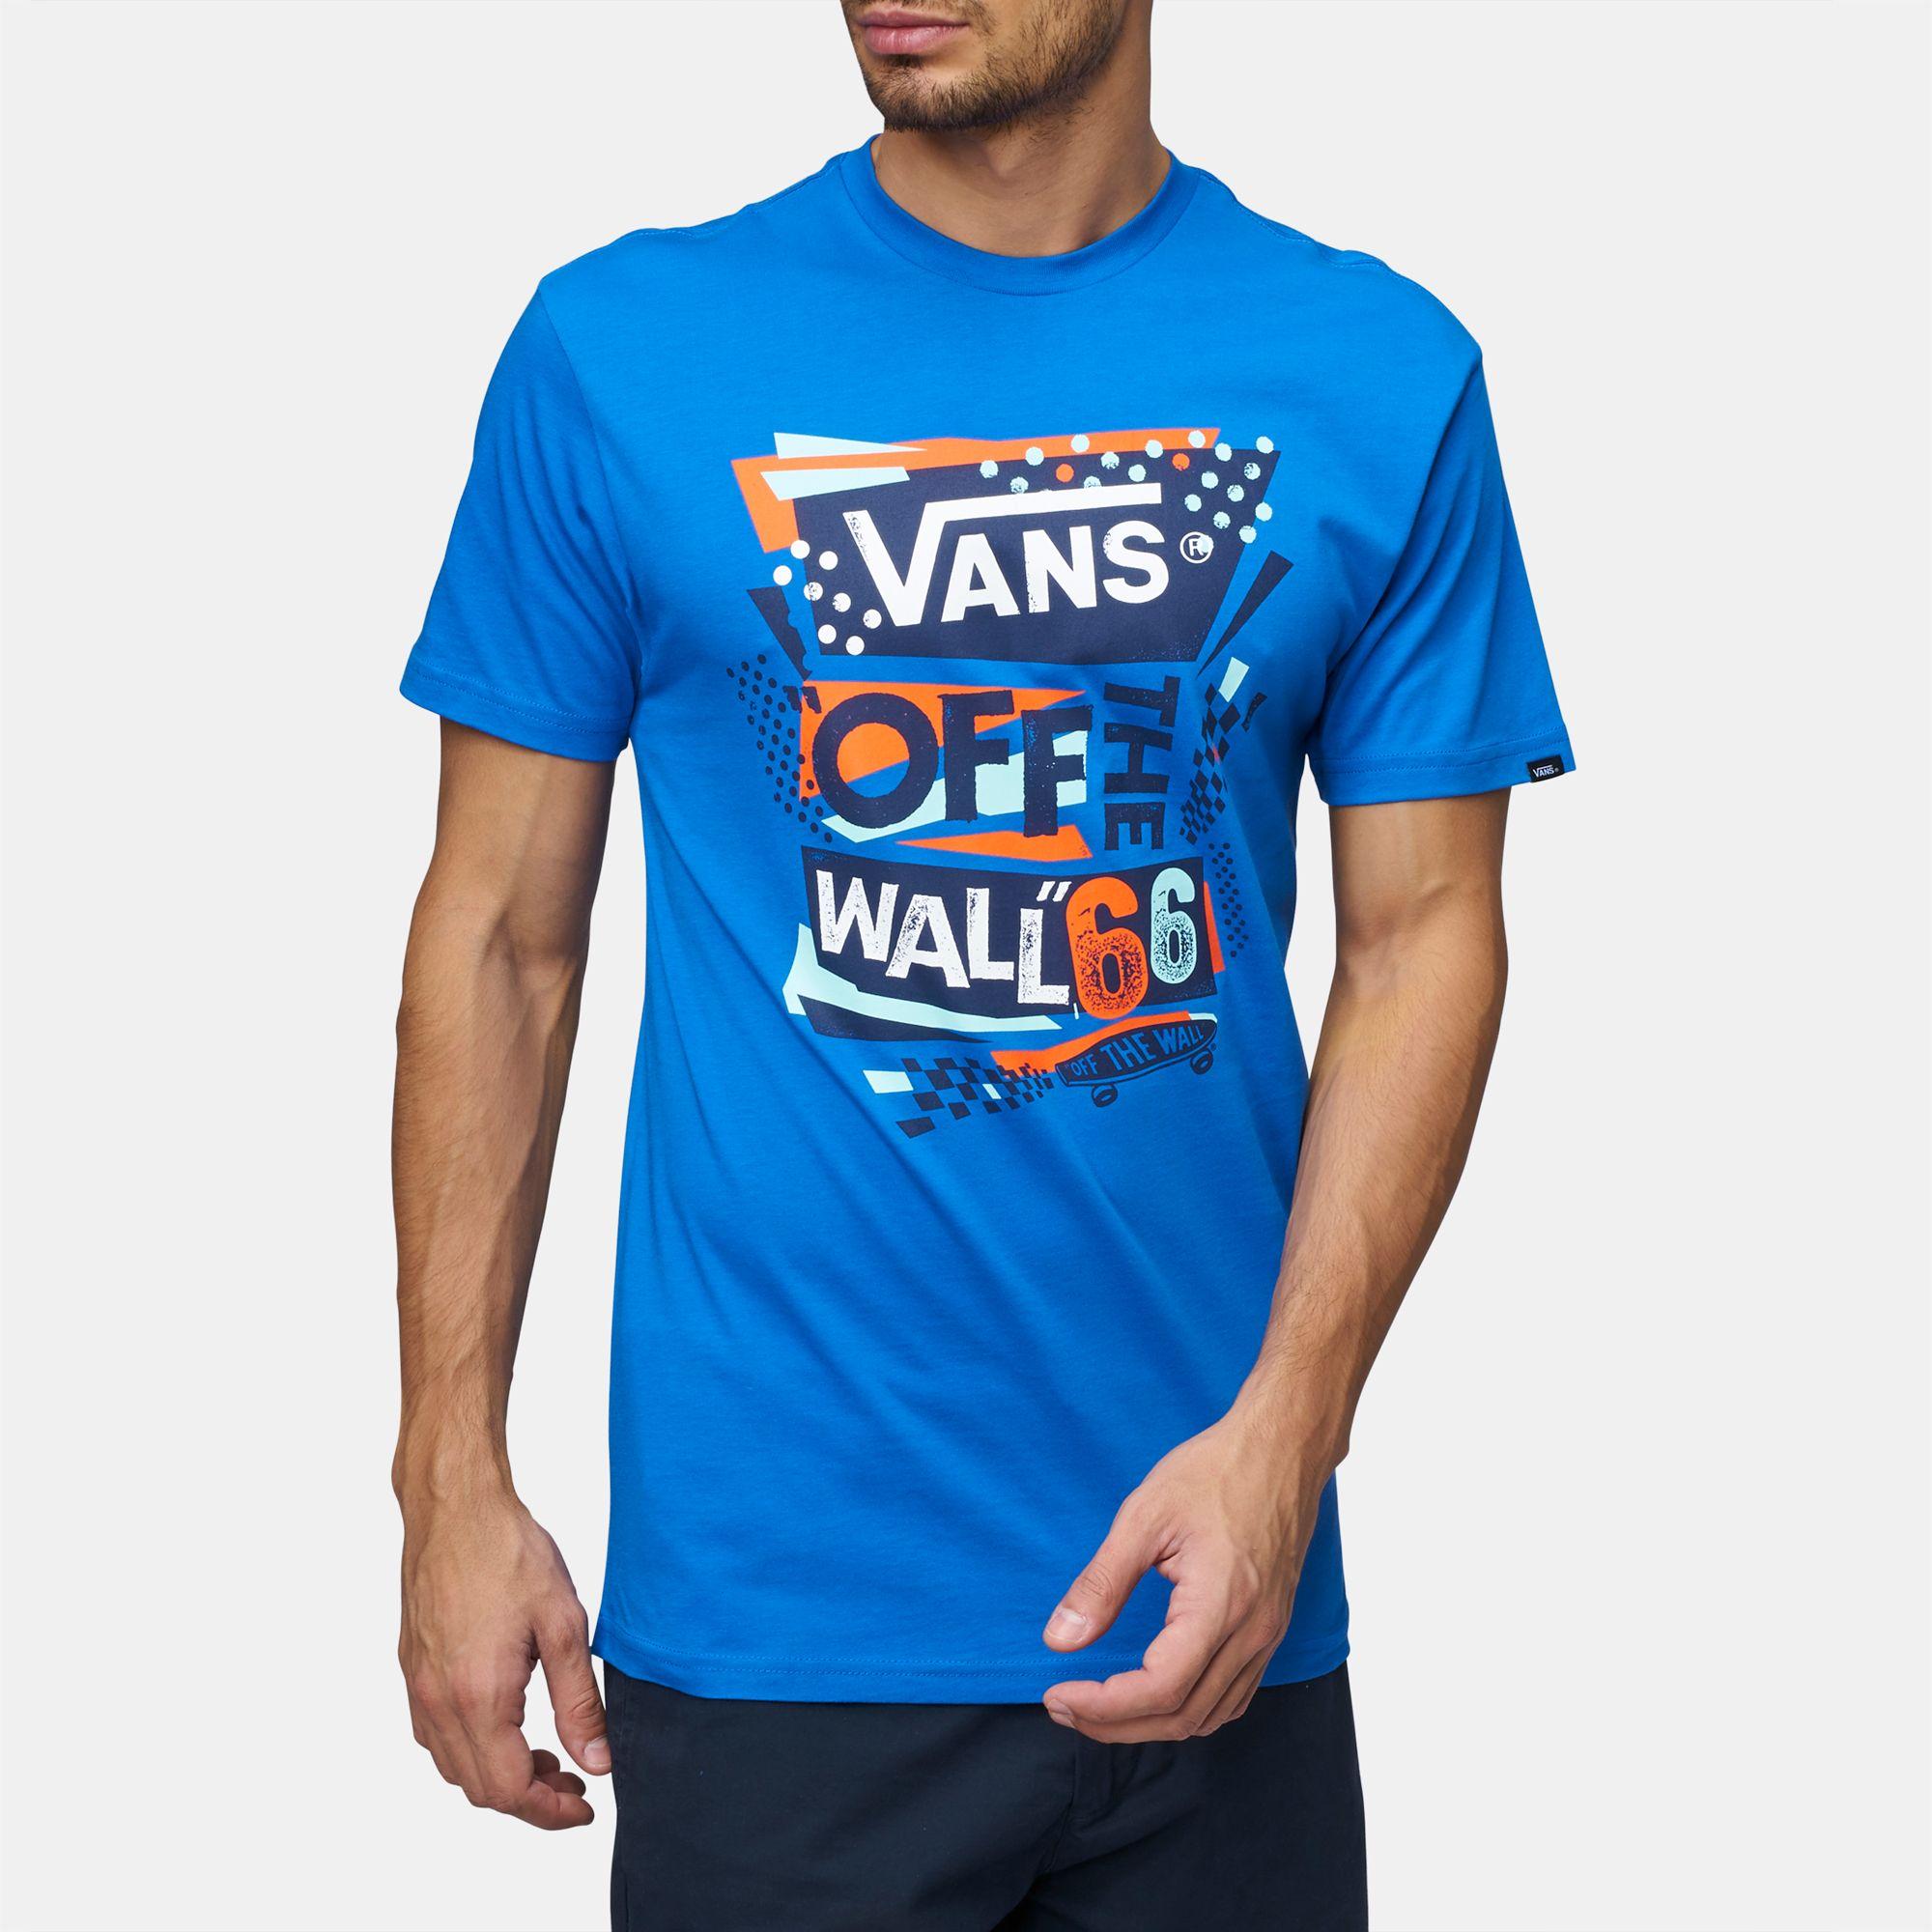 b272841b3b9fa9 Blue Shop 41 Vans Stenciled II T-Shirt for Mens by Vans